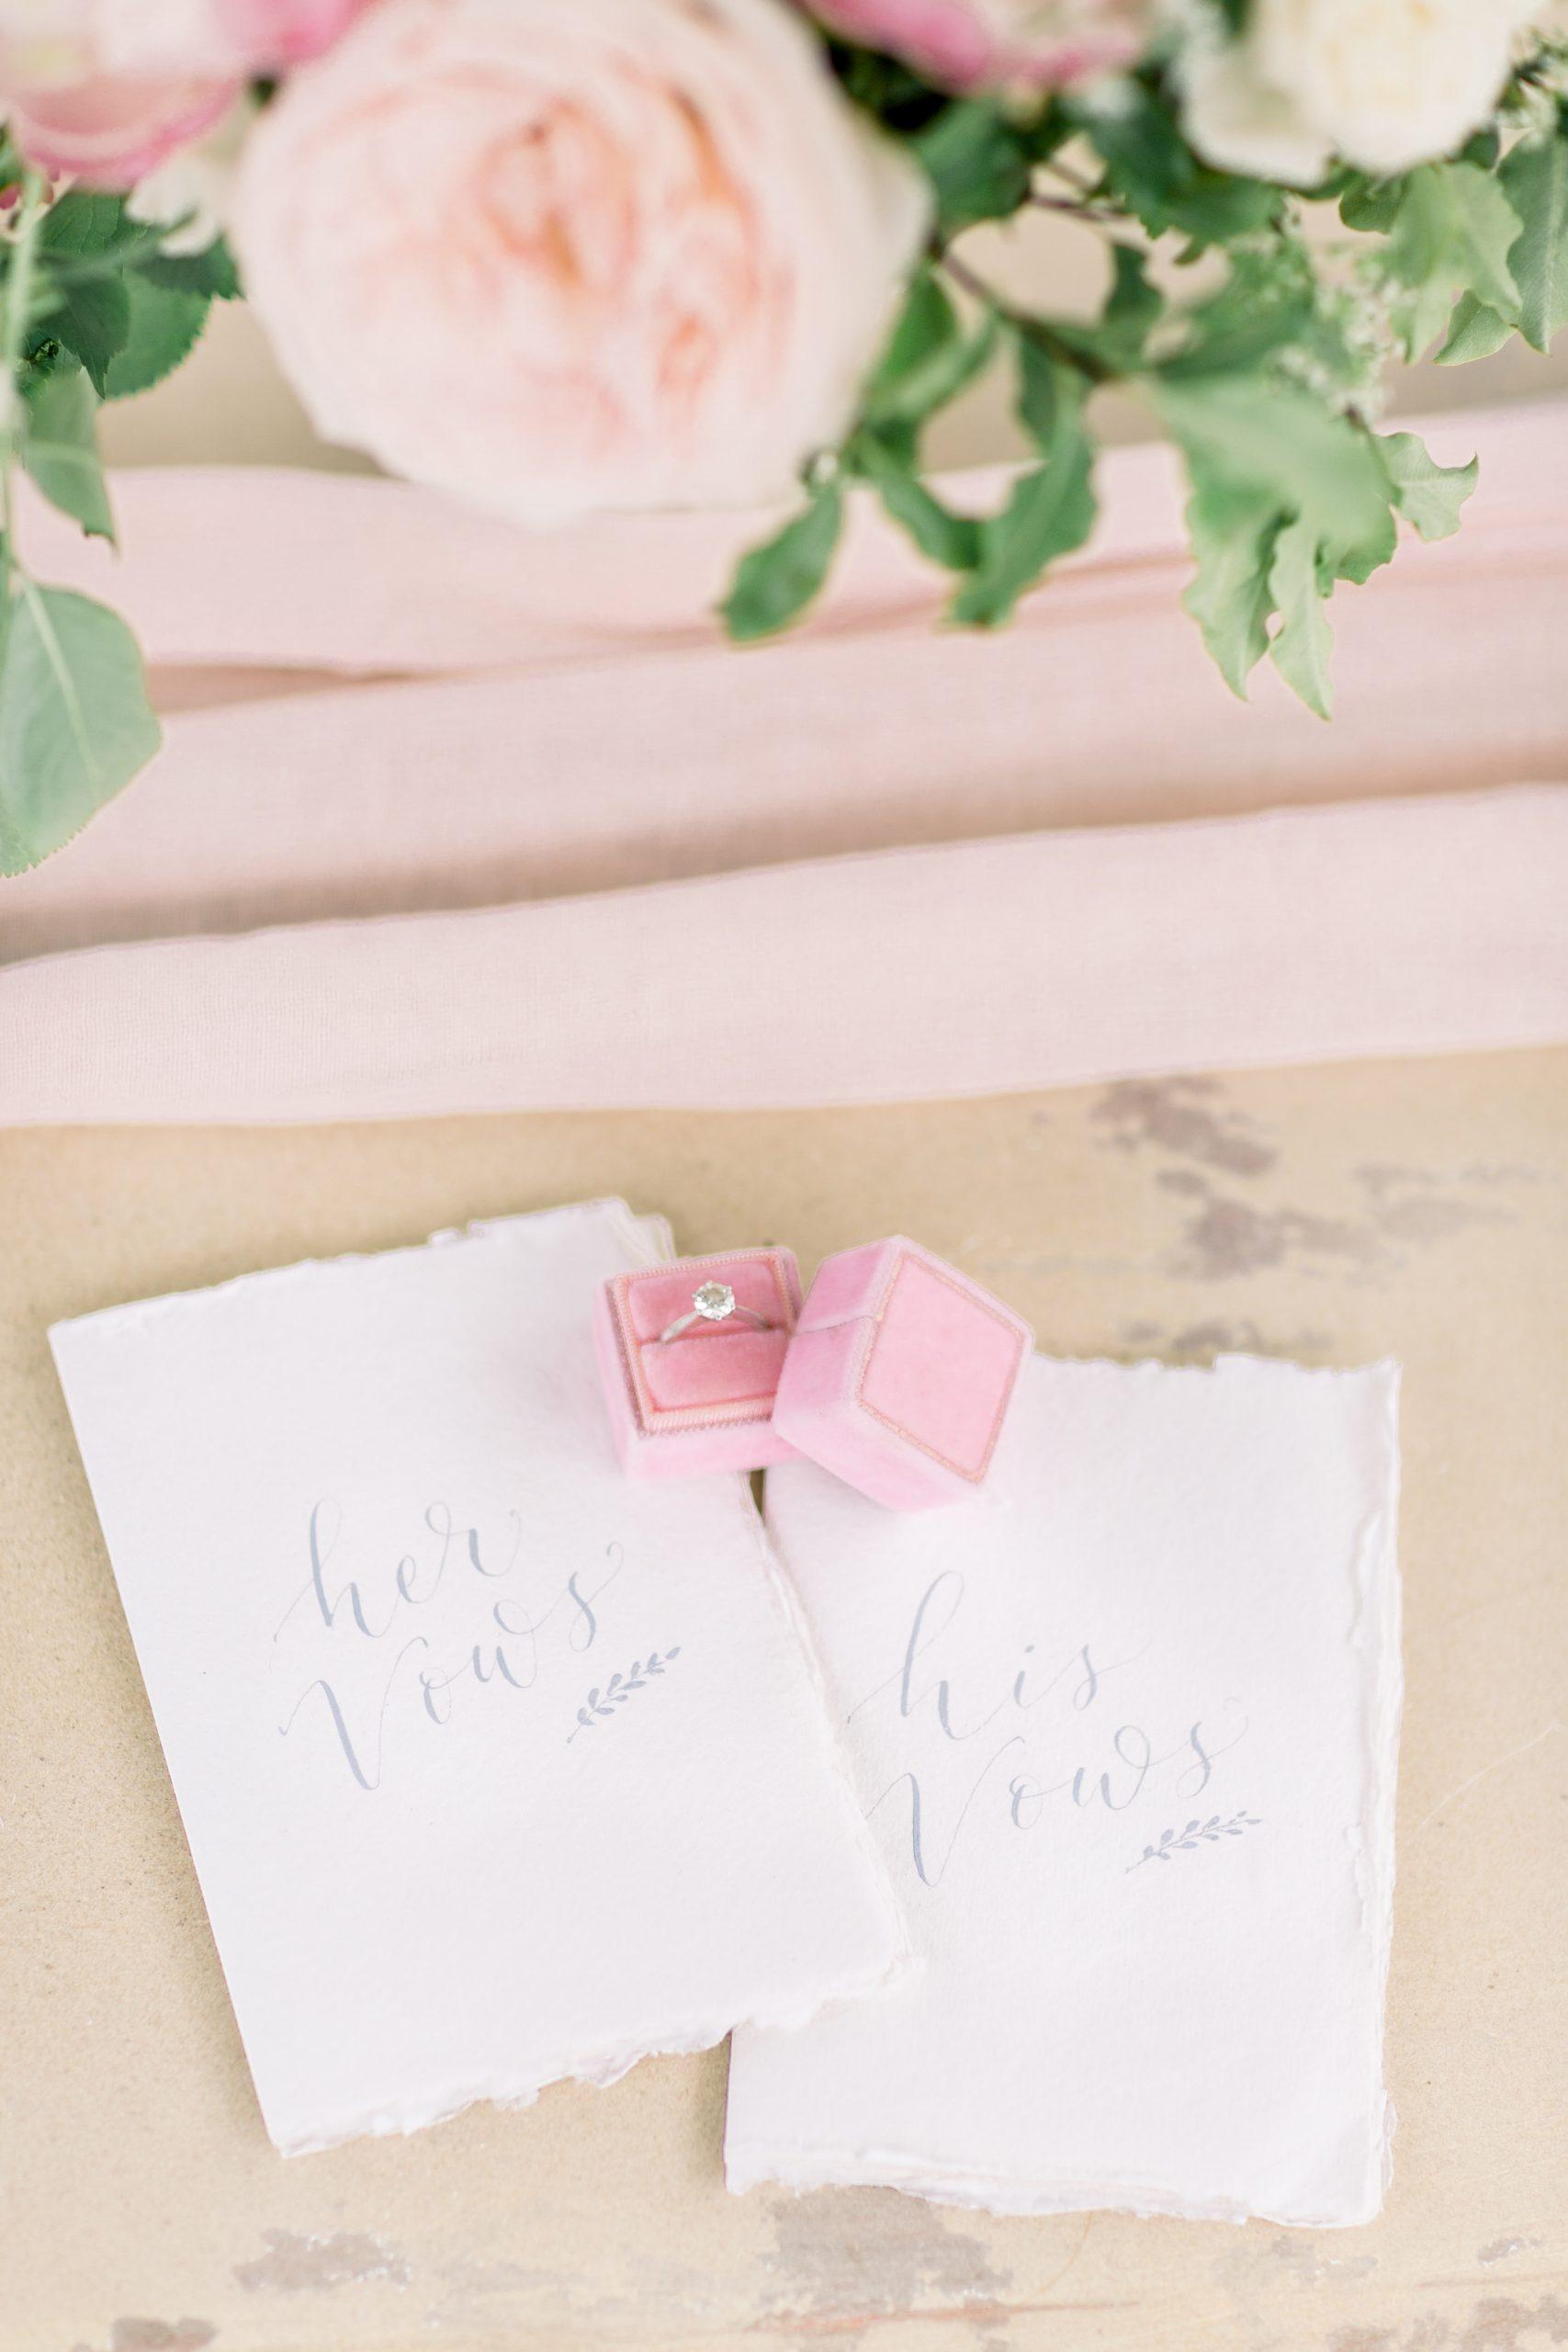 His & Her's Wedding Vow Book | Essex Wedding Planner